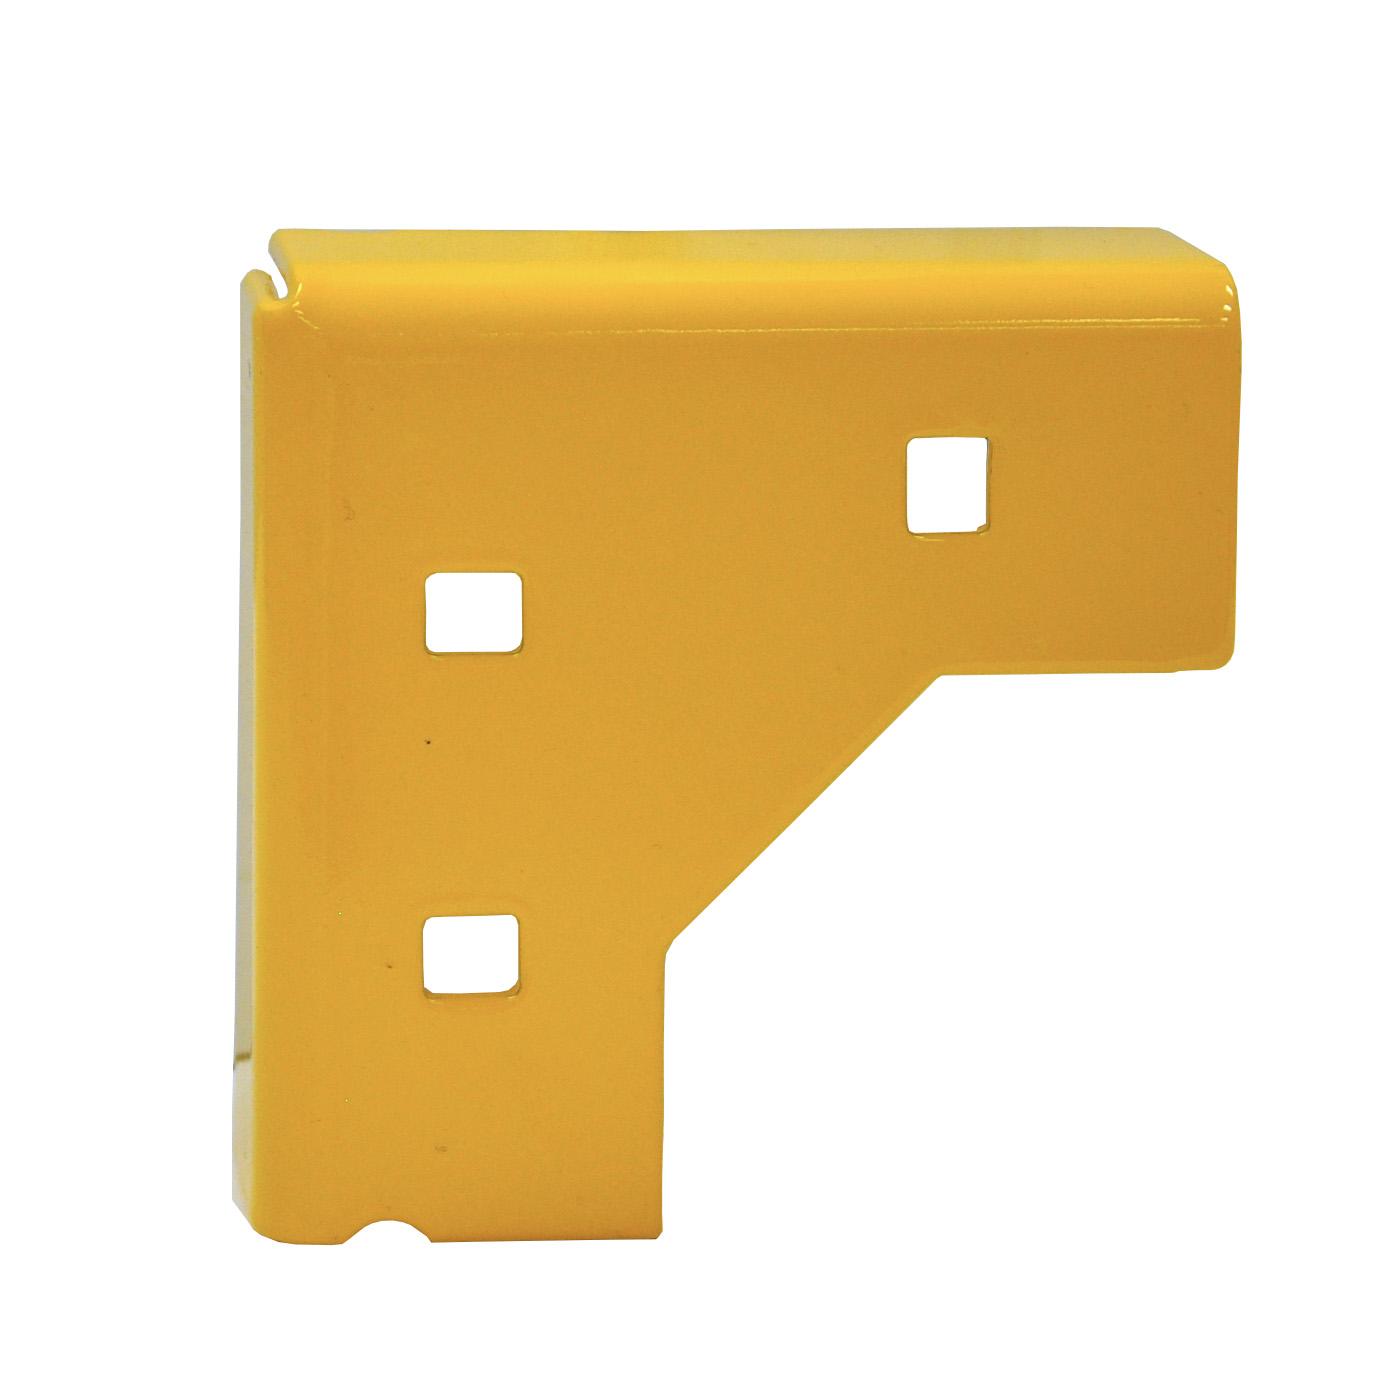 A12828-lh-hinge-gate-corner-bracket-1400w